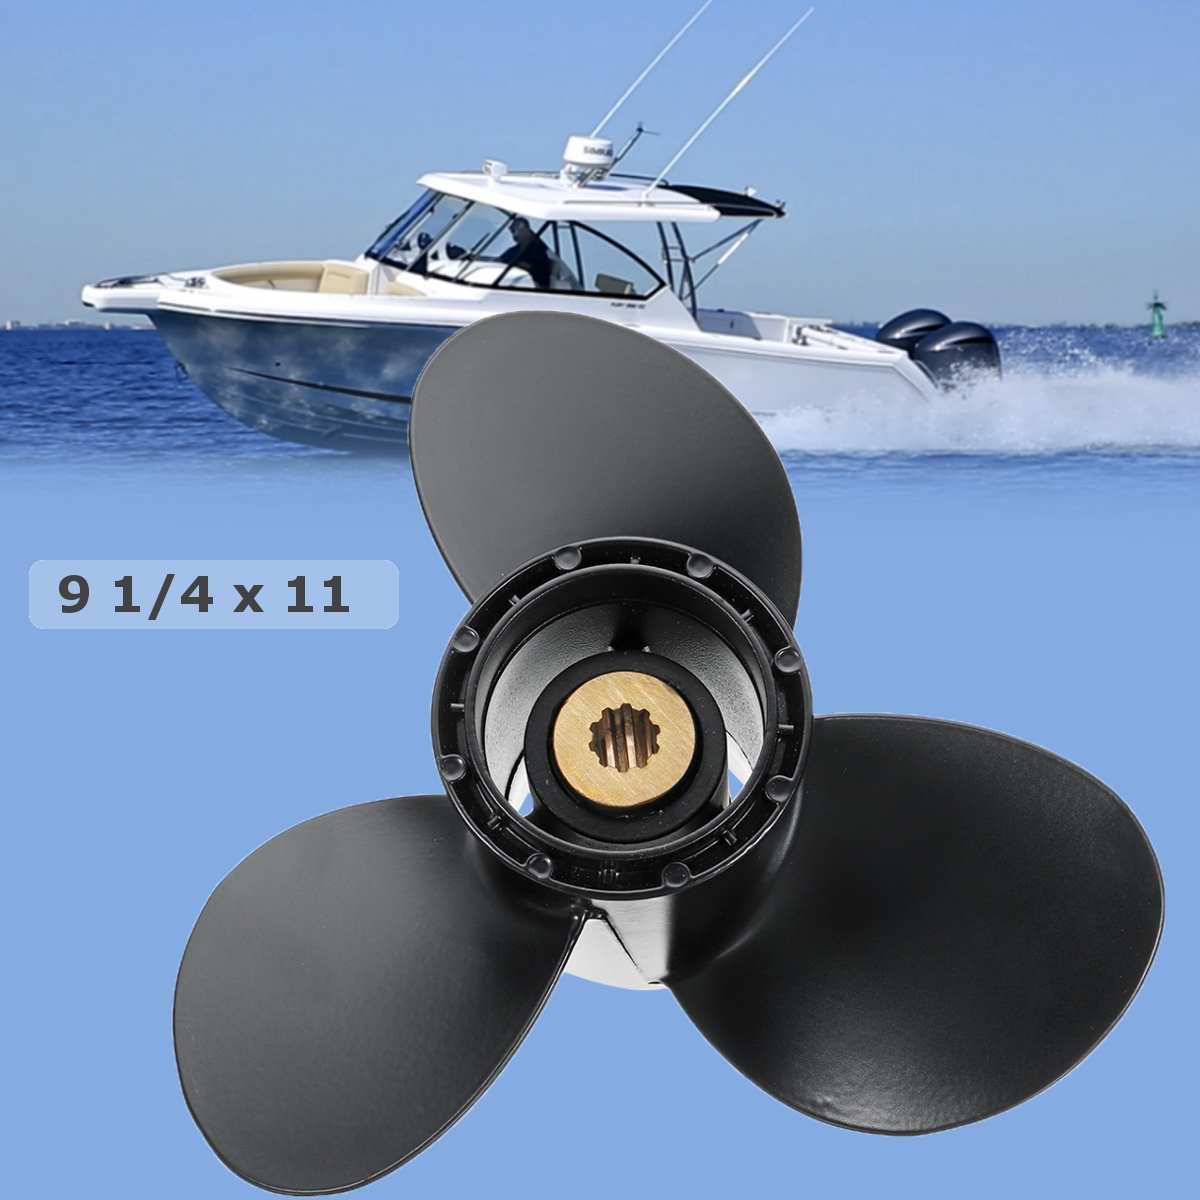 9 1/4 x 11 Aluminum Boat Outboard Propeller for Suzuki 9.9 15HP 58100 93743 019 Aluminium Alloy Black 3 Blades 10 Spline Tooth Boat Engine    - AliExpress